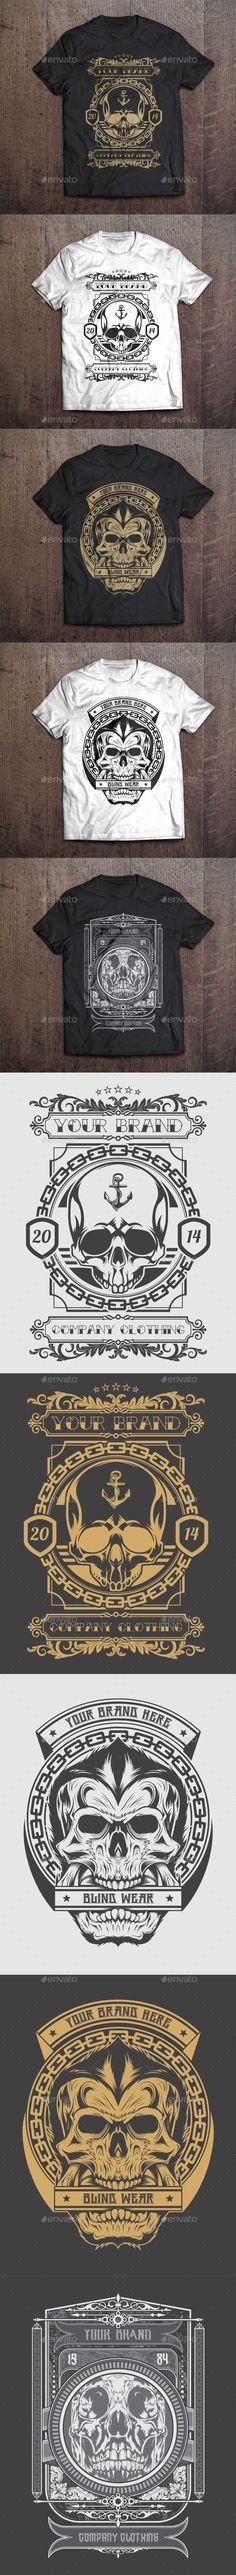 3 #T-Shirt #Illustration - Skull Theme - #Designs T-Shirts Download here: https://graphicriver.net/item/3-tshirt-illustration-skull-theme/9475040?ref=alena994